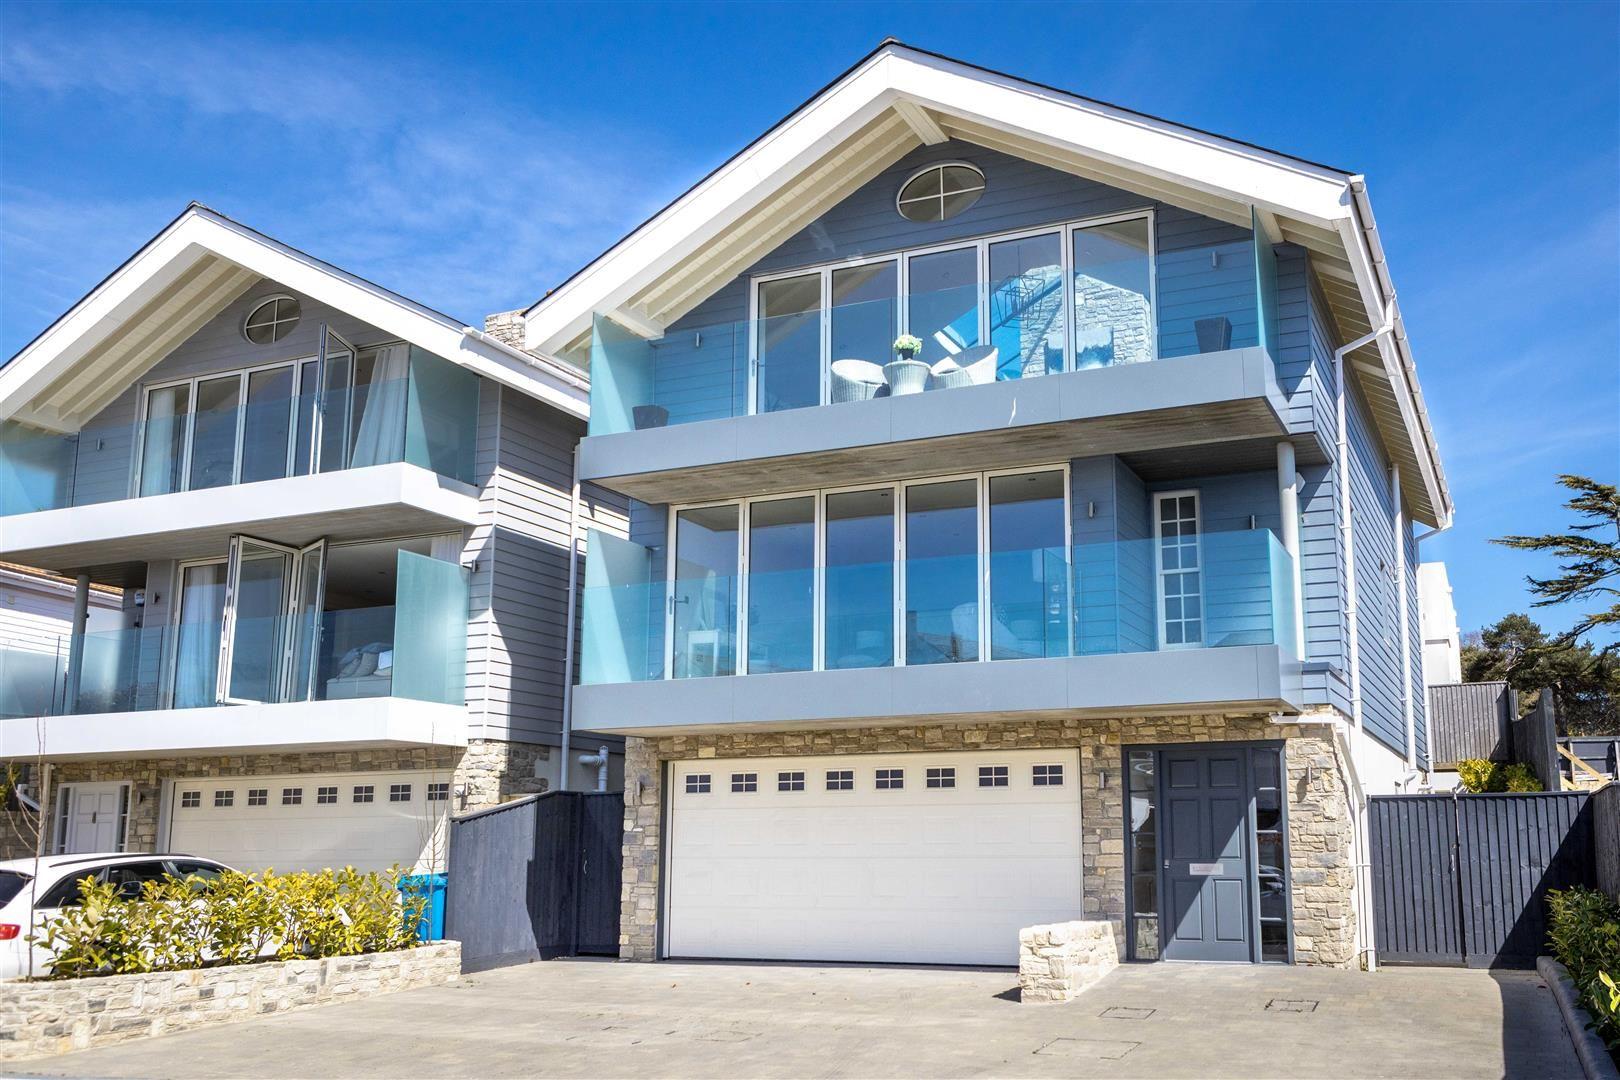 Property photo 1 of 17. 3 Dorset Lake Avenue, Lilliput 23.04.21 ©Tom Burn